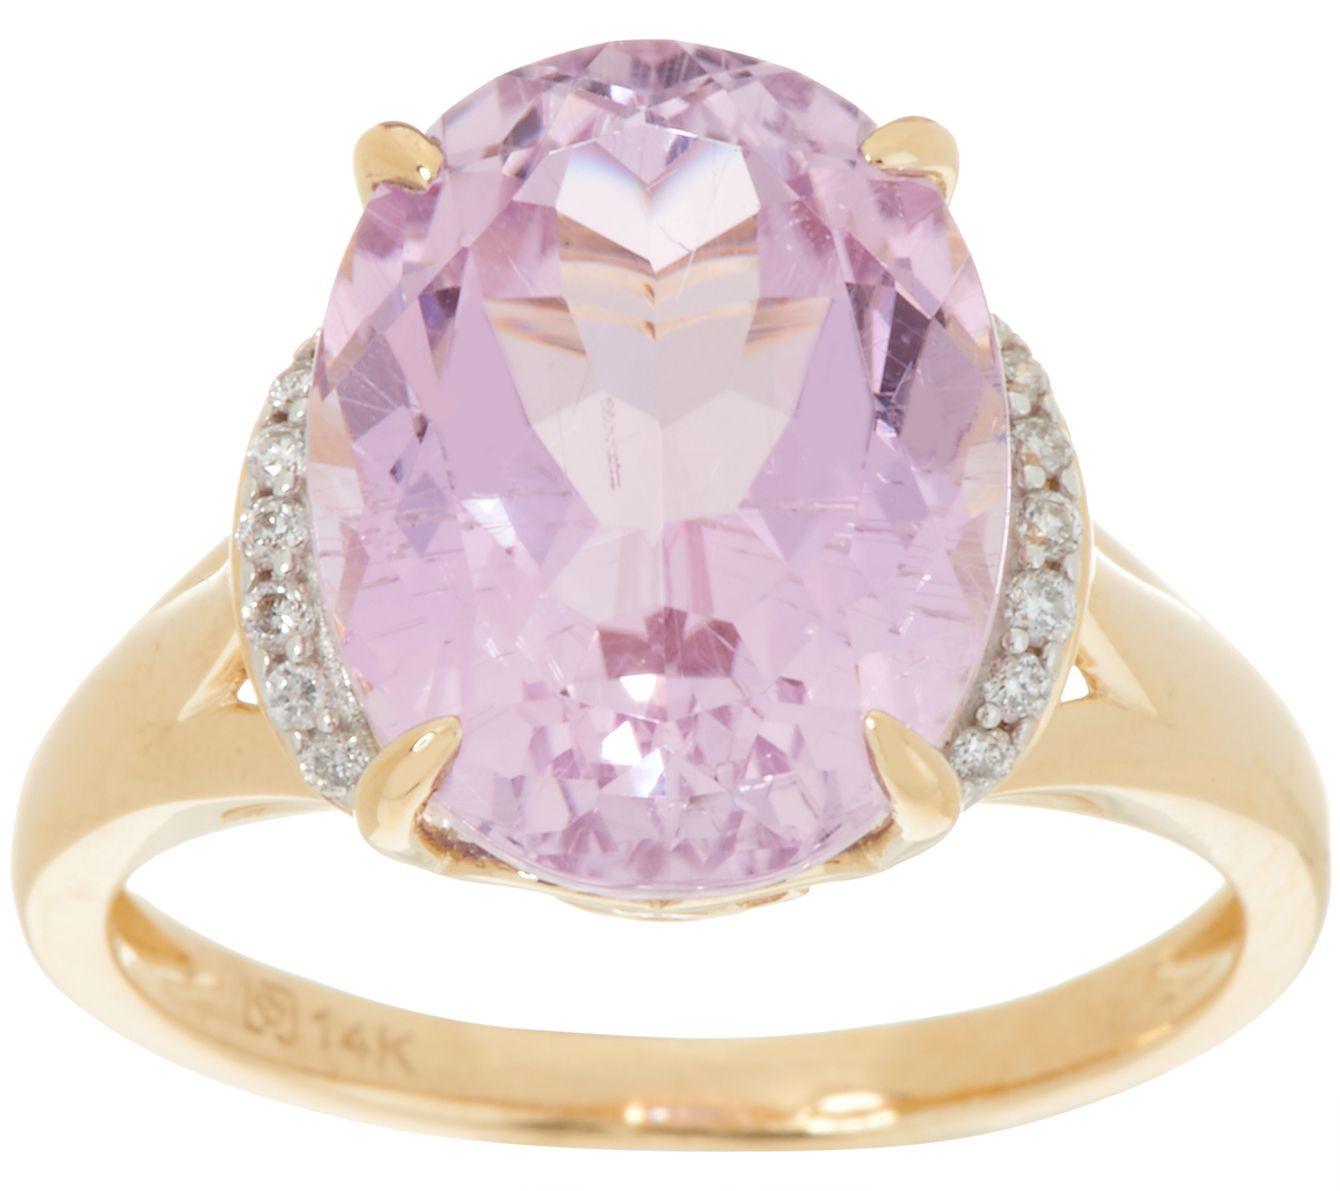 Oval Kunzite & Diamond Ring 14K Gold 5.70 ct - Page 1 — QVC.com